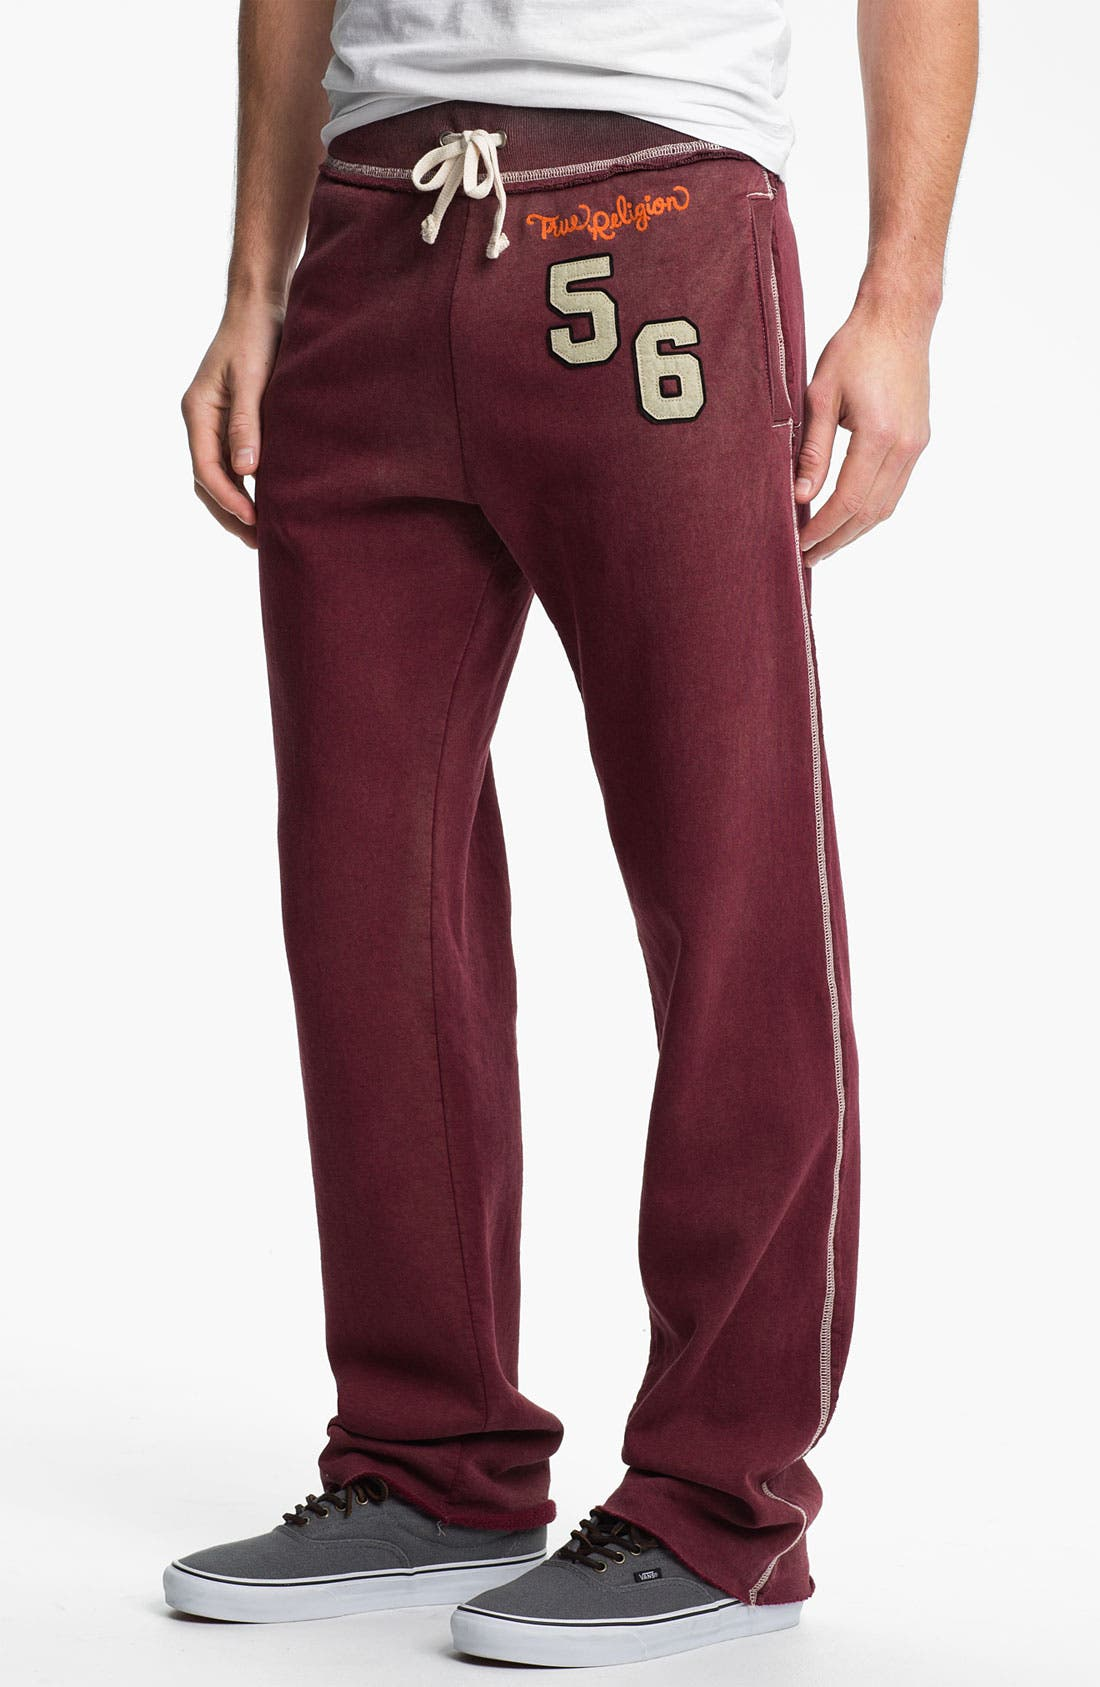 Alternate Image 1 Selected - True Religion Brand Jeans 'Rockwood Tiger' Athletic Pants (Online Exclusive)